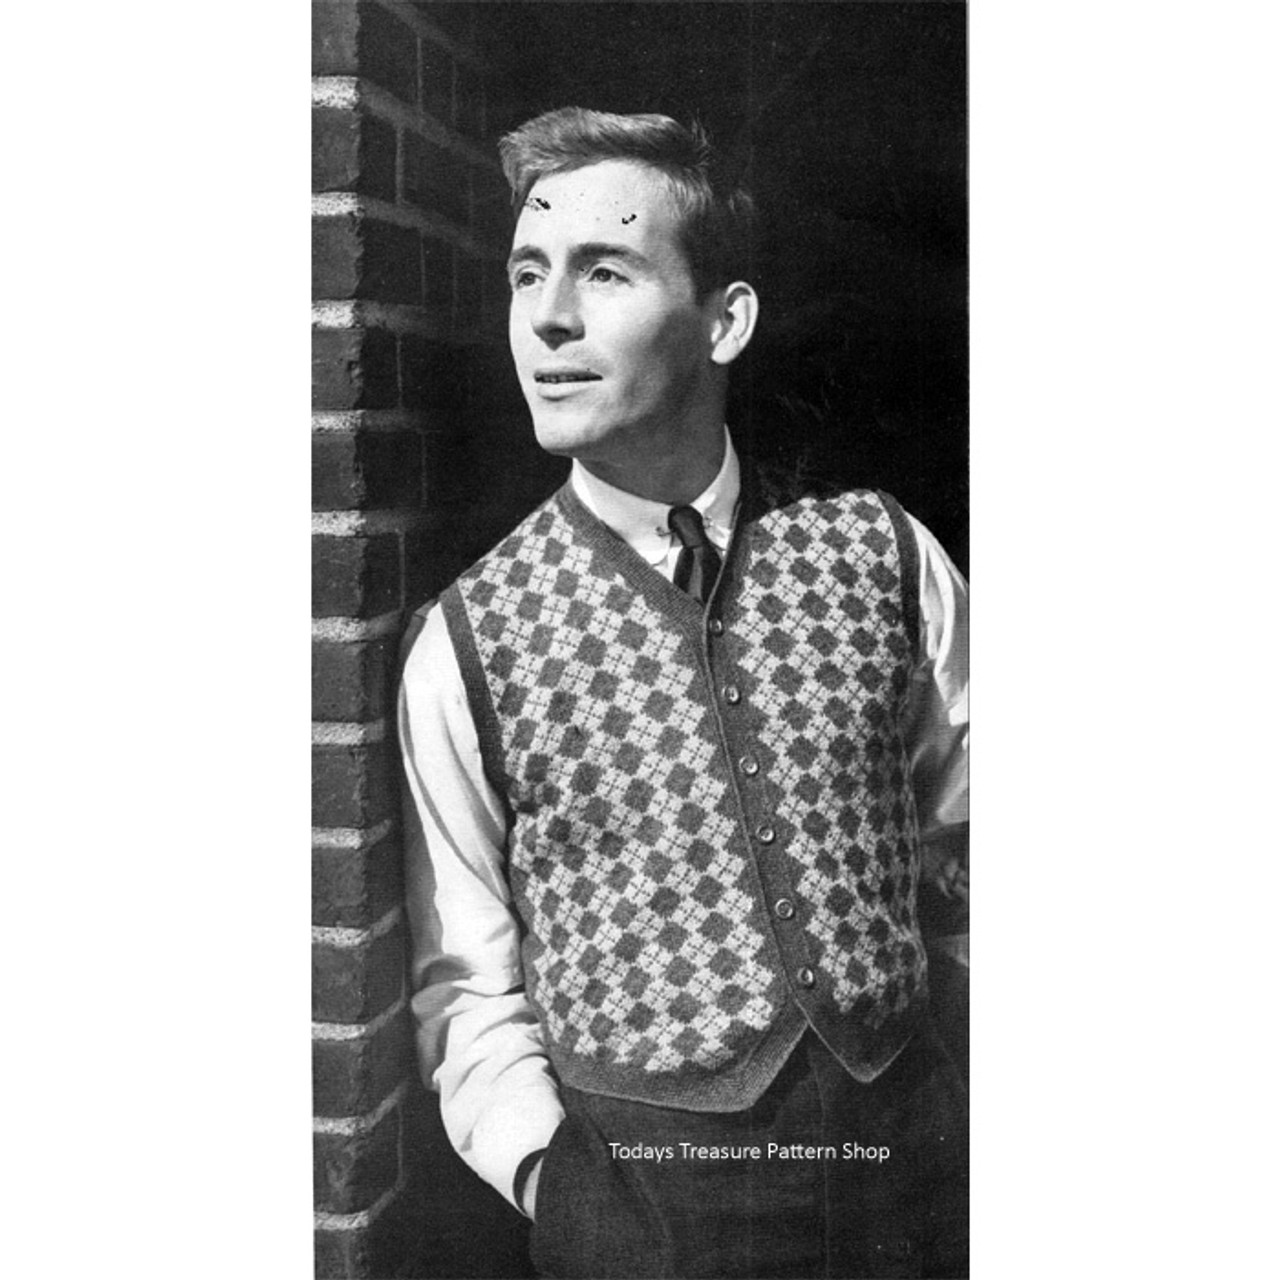 Mans Knitted Vest Pattern in Diamond Motif